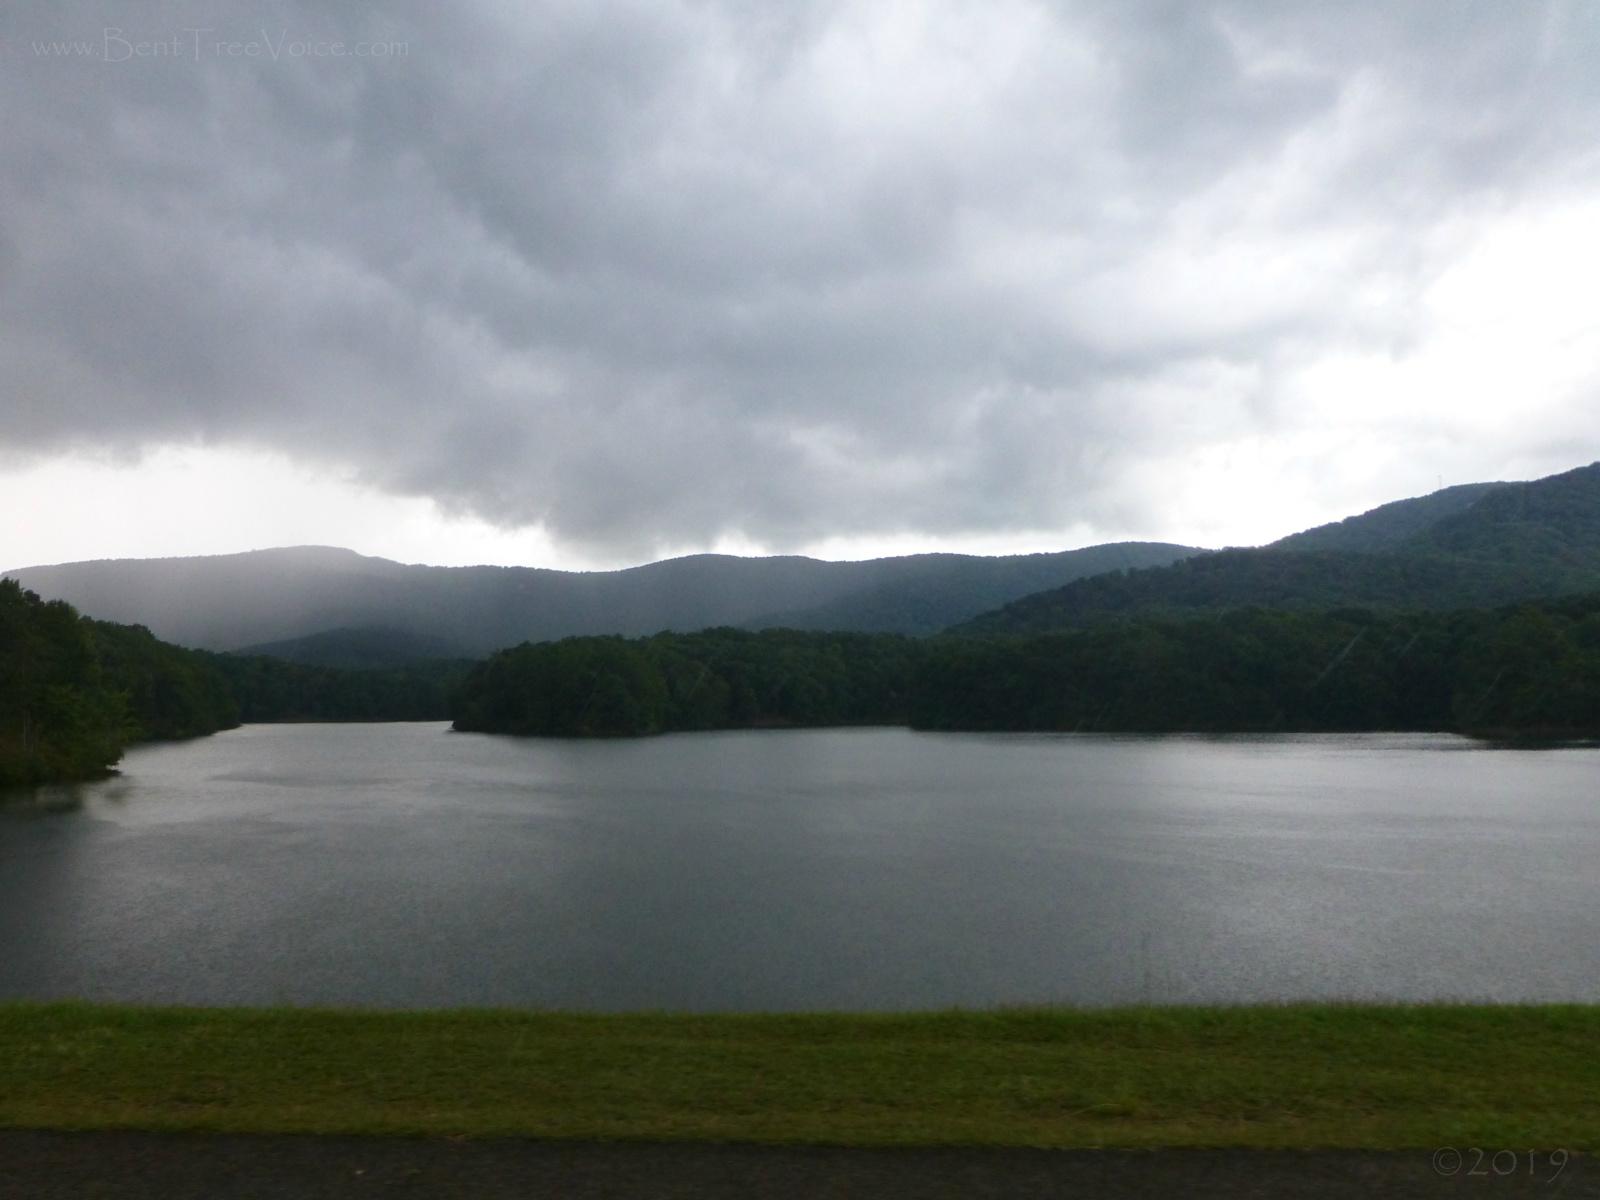 July 18, 2019 - Rain Clouds over Lake Tamarack